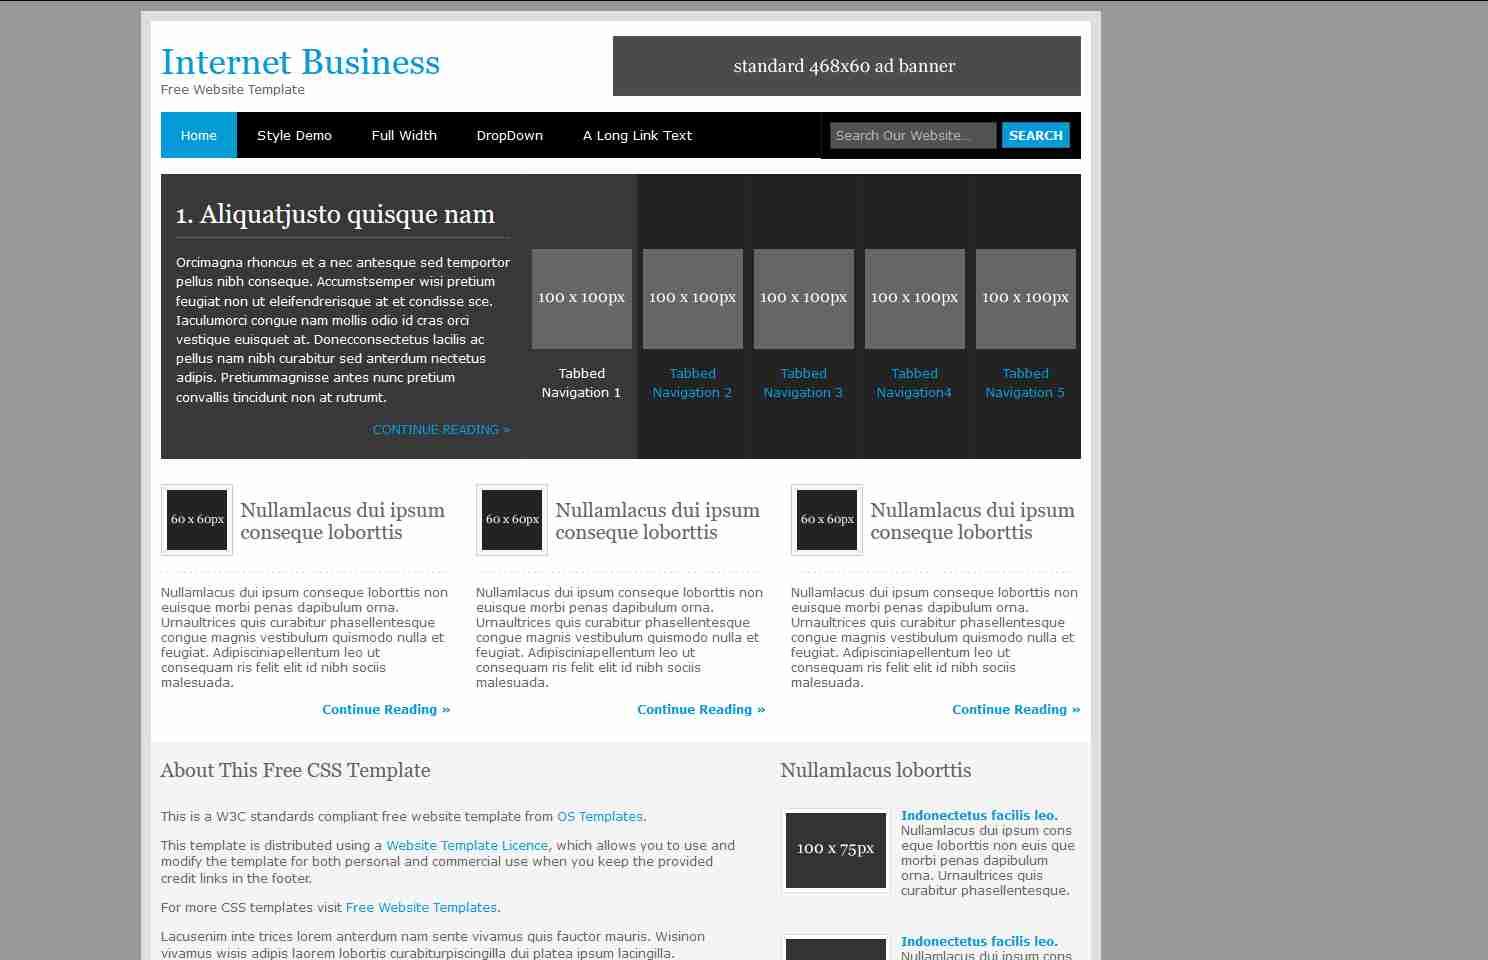 Online Store E-commerce Responsive Website Using HTML/CSS